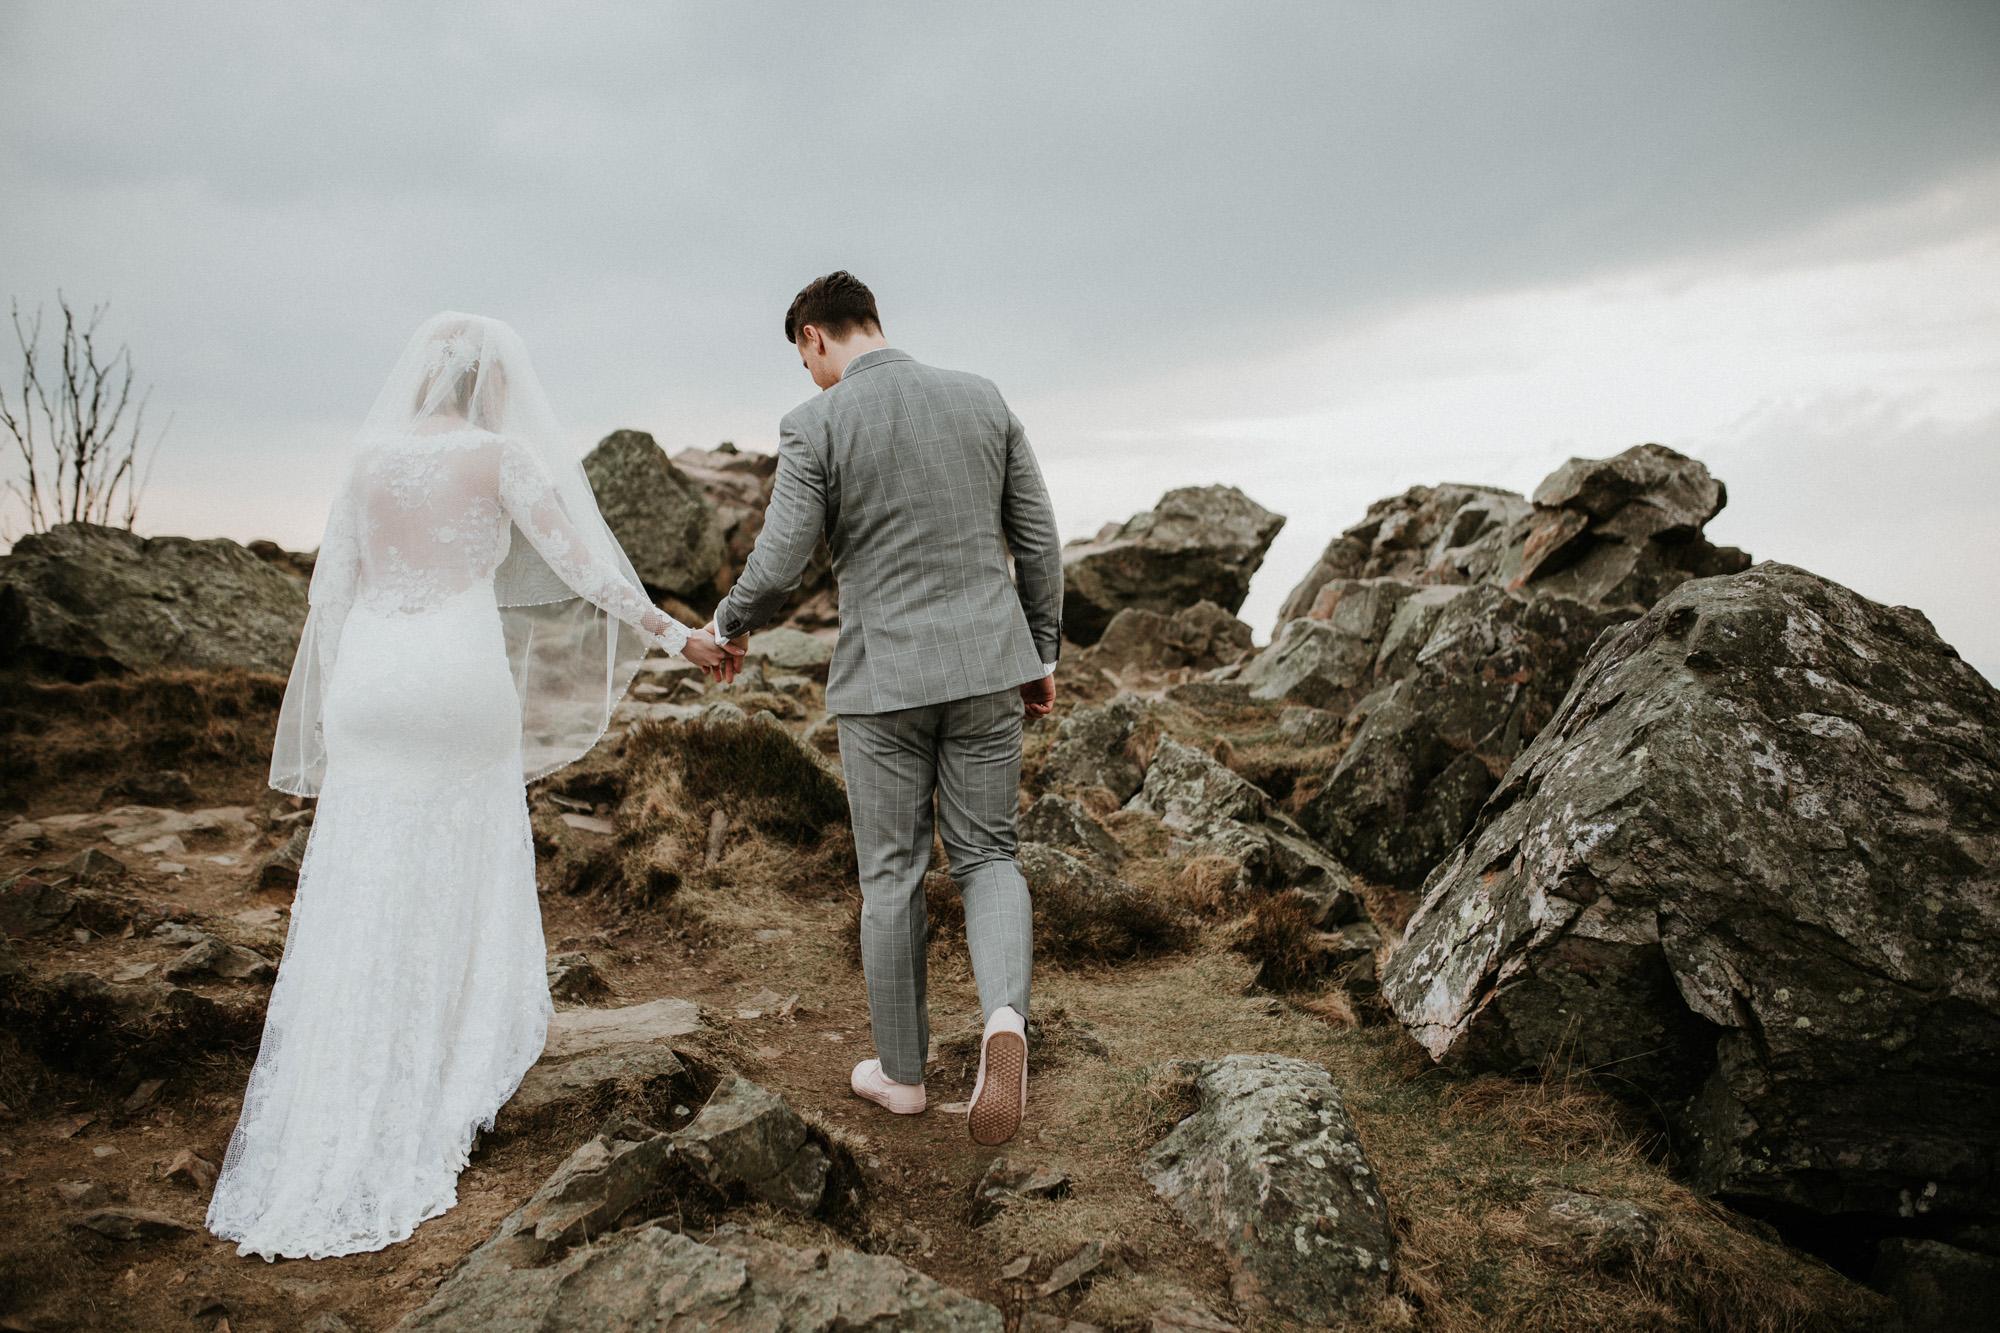 DanielaMarquardtPhotography_Hochzeitsfotograf_Düsseldorf_Köln_Mallorca_Bayern_Austria_Harz_LinaundMaik_Afterwedding-Shooting_Weddingphotographer_Ibiza_Tuskany_Italien_Toskana4